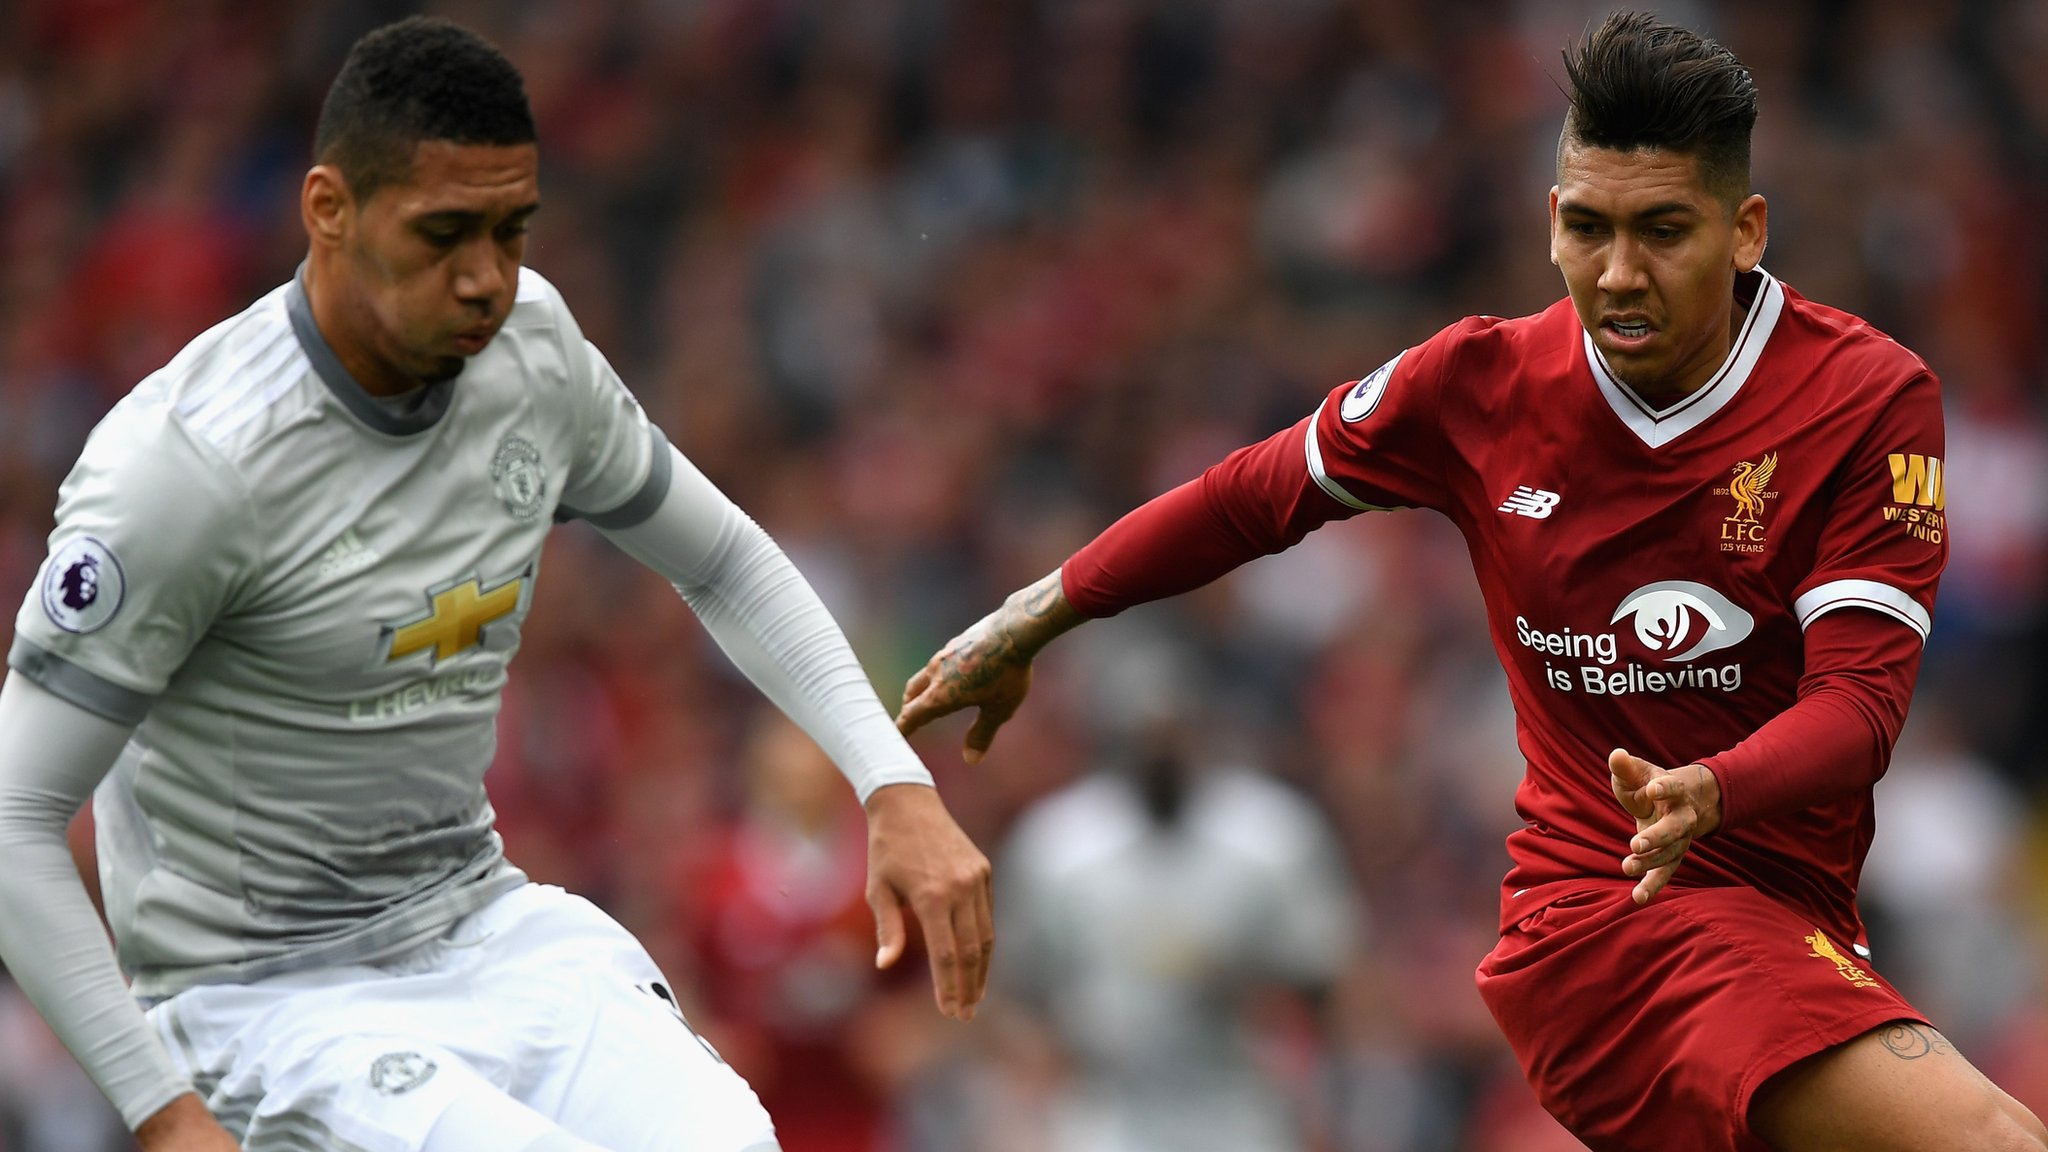 'The biggest game I can imagine' - Klopp on Man Utd v Liverpool